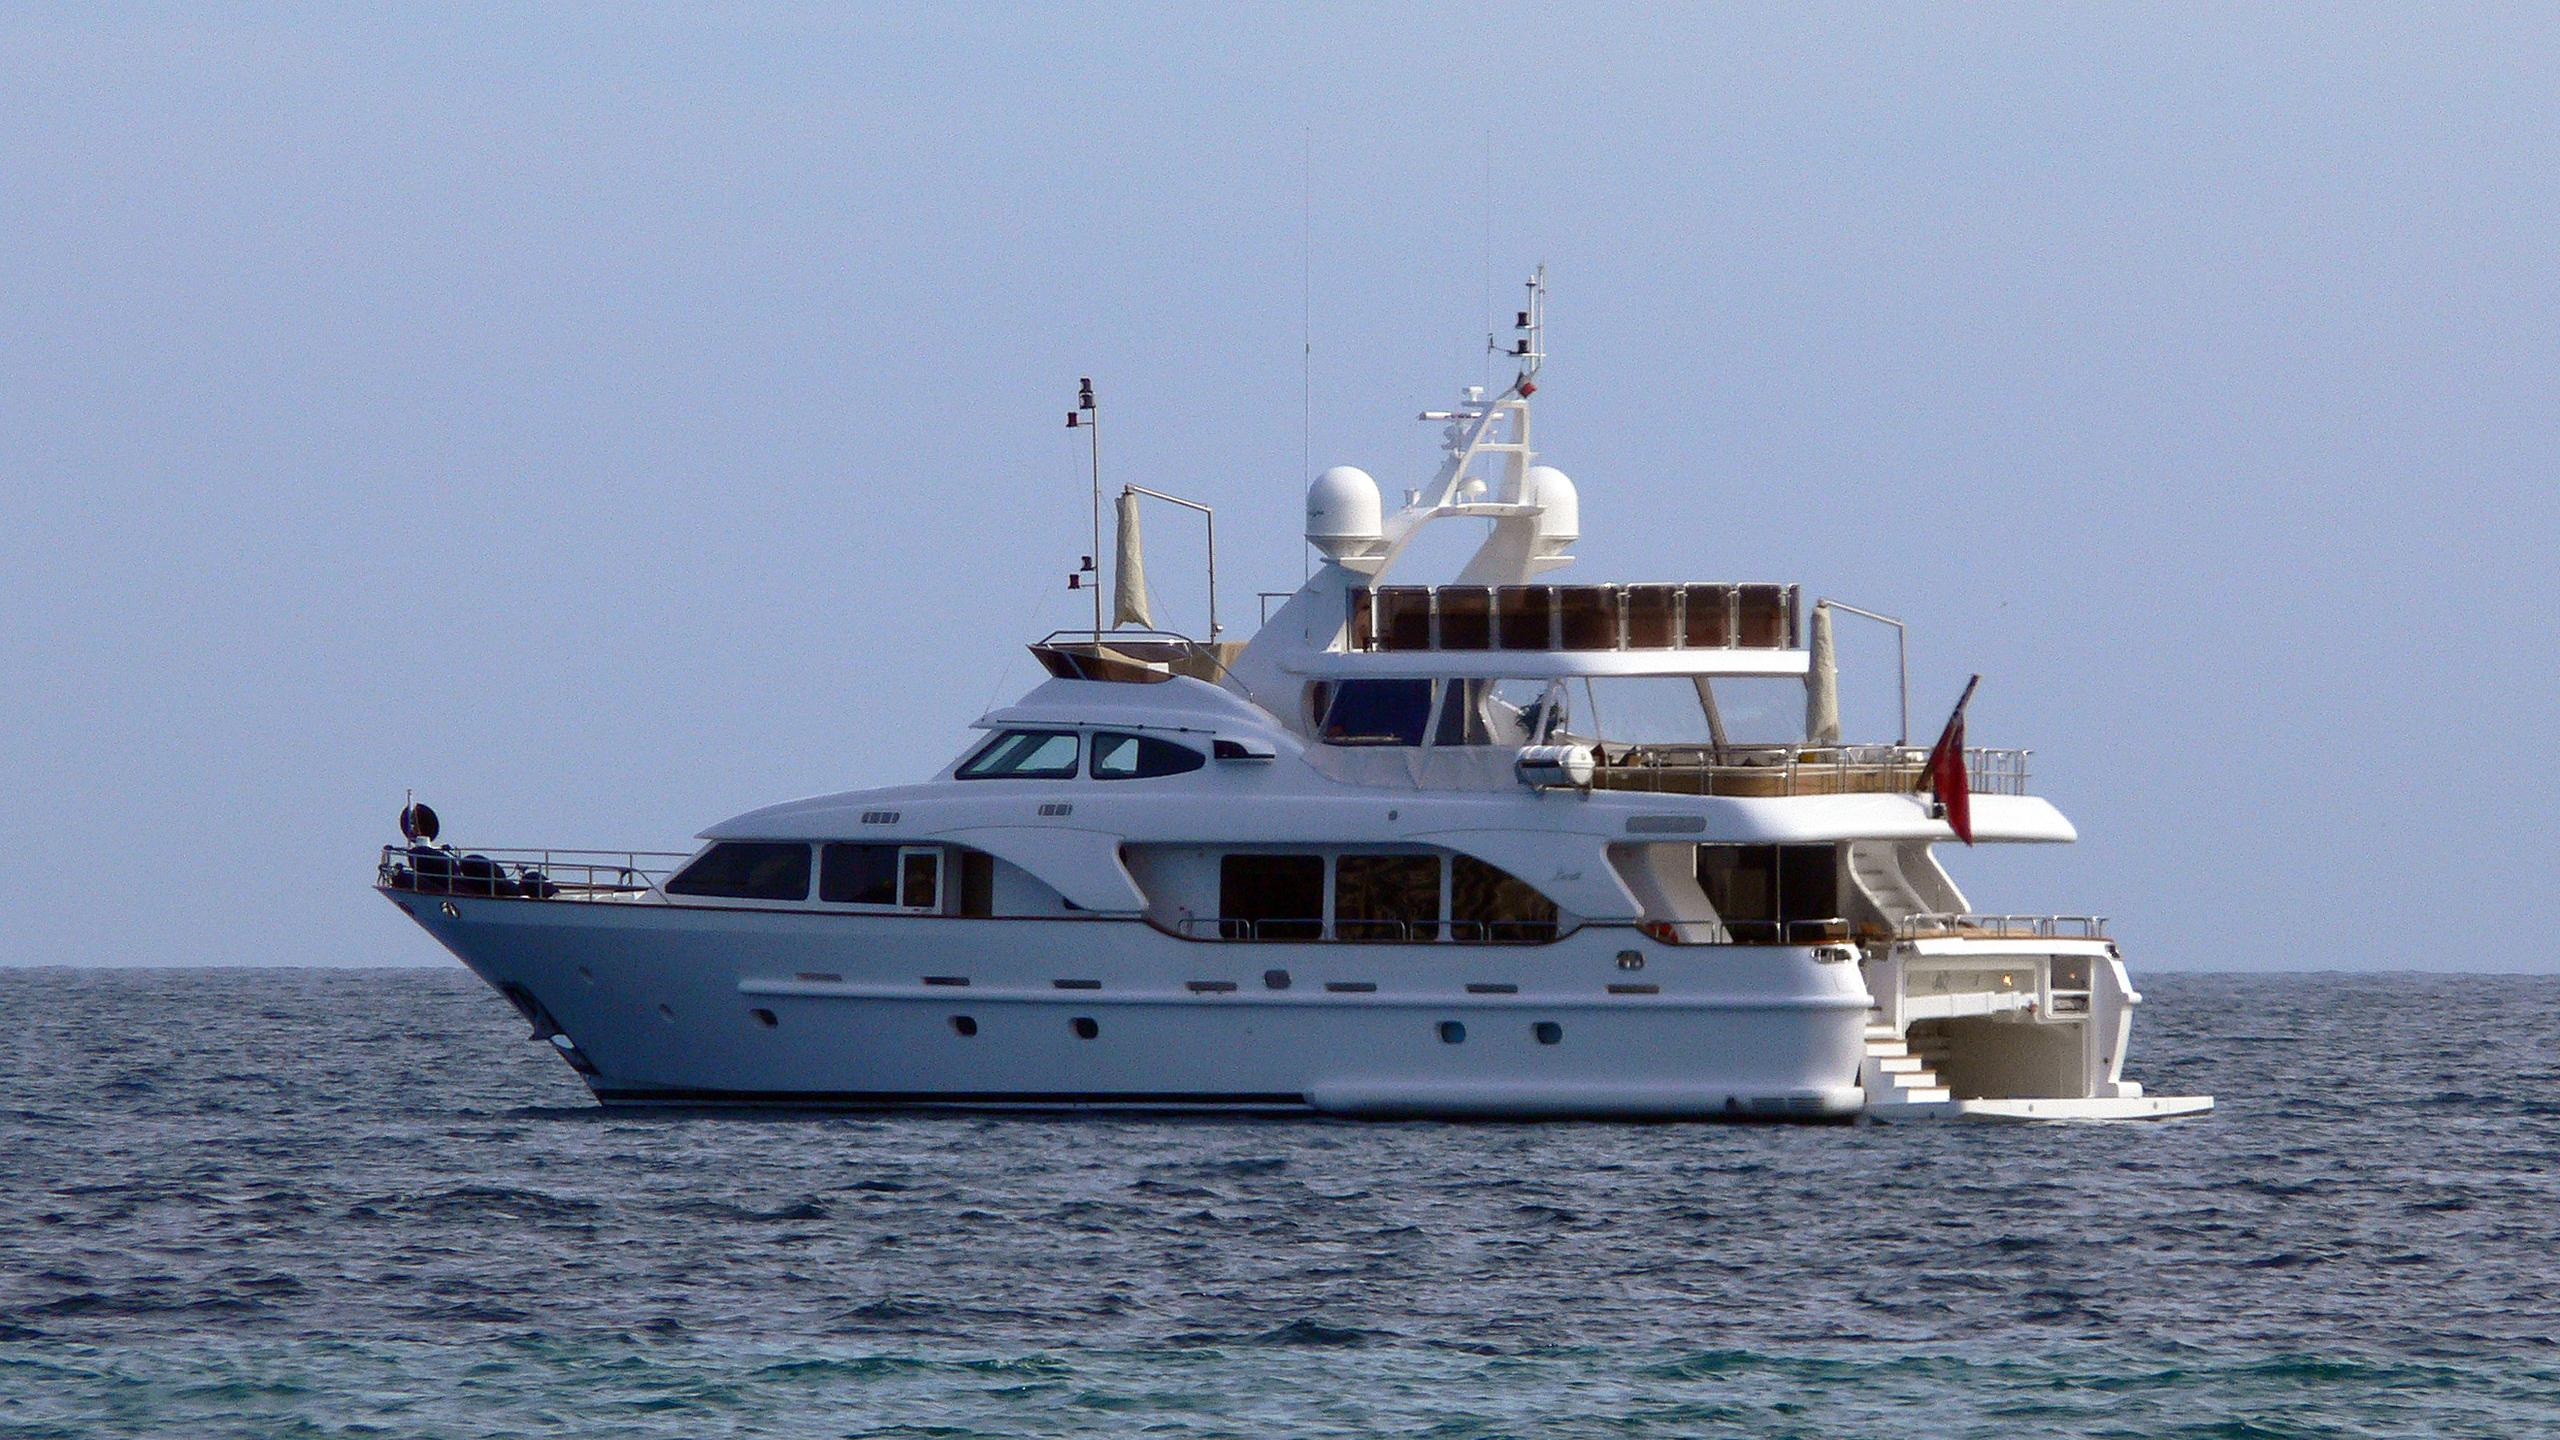 jazz-motor-yacht-benetti-tradition-2007-30m-half-profile